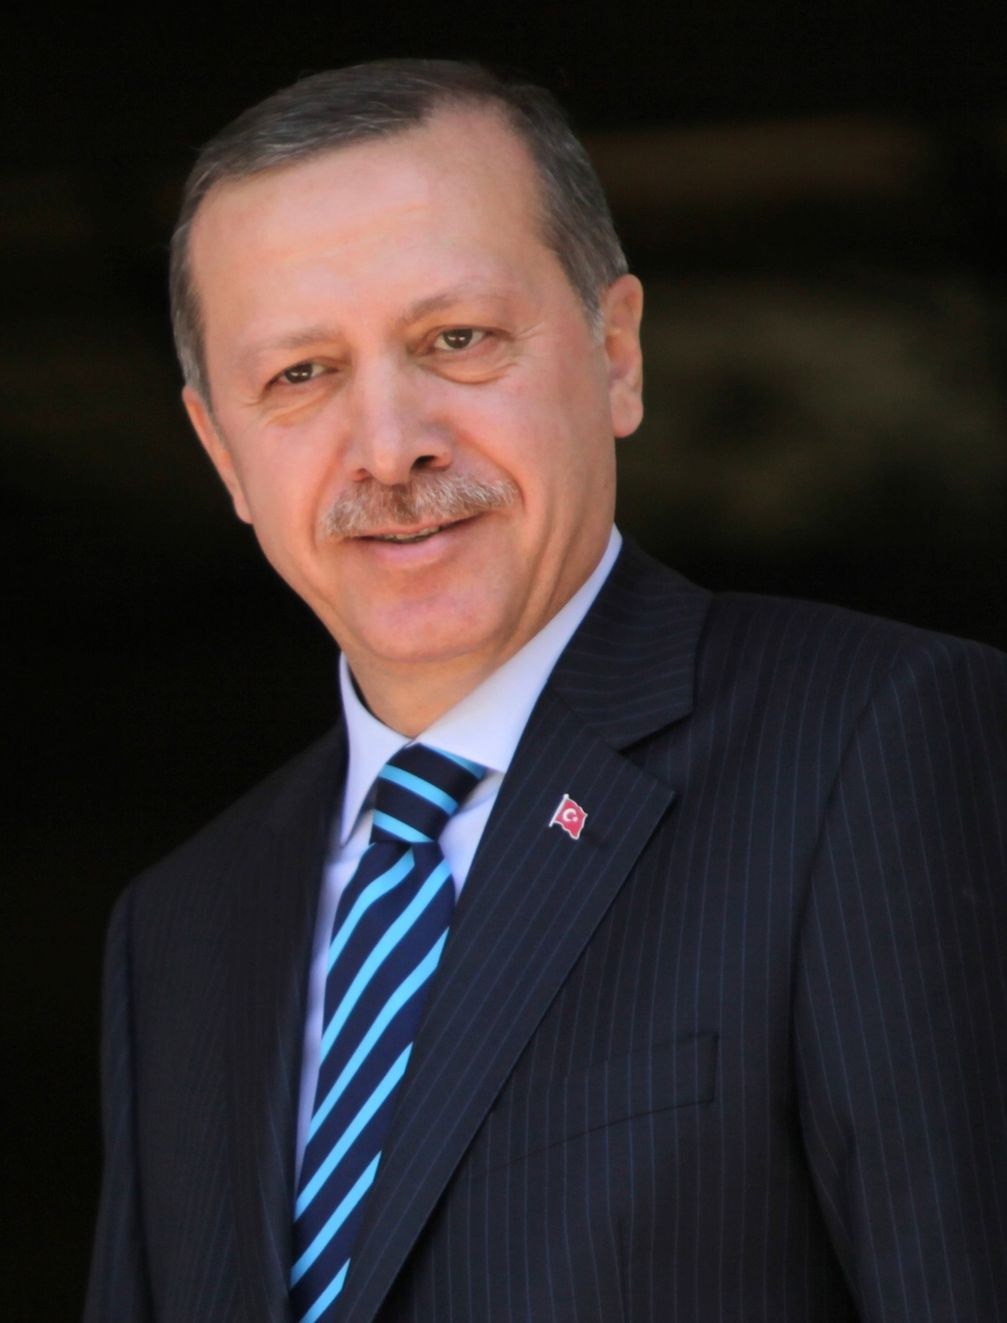 Recep Tayyip Erdoğan, 2010